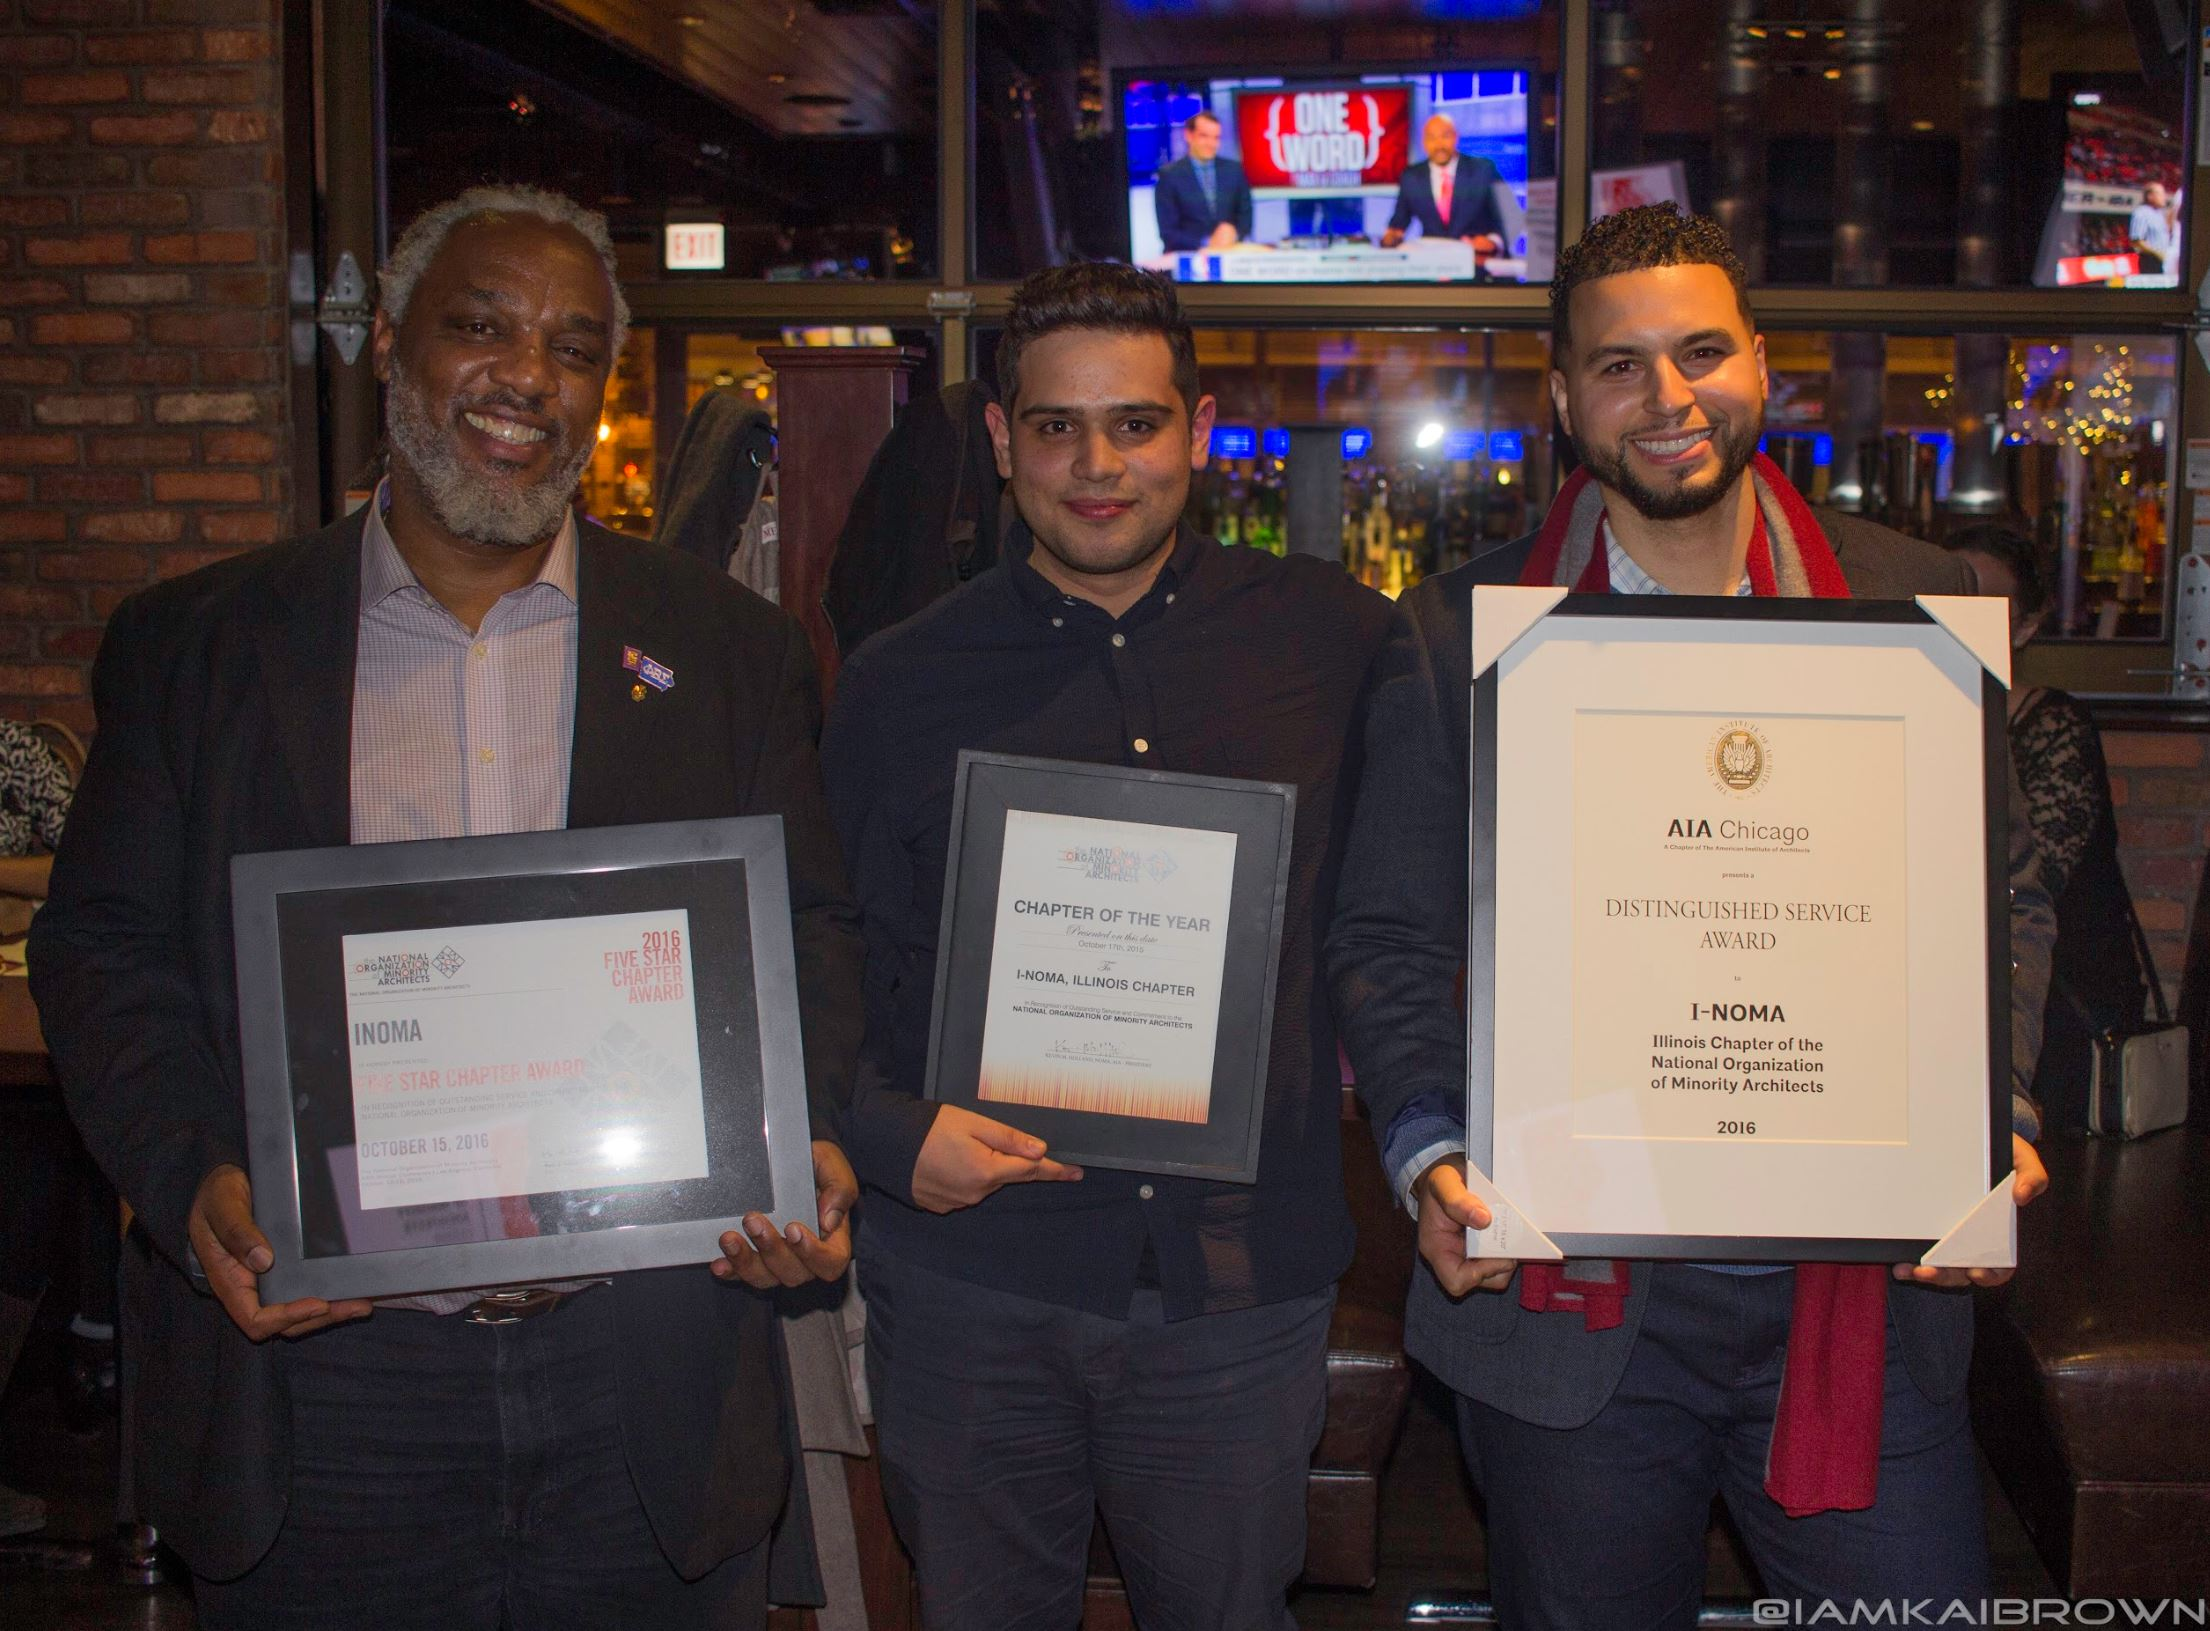 2017 - [Left to Right] Bryan Hudson, Christian Pereda, Oswaldo Ortega - I-NOMA Accolades from NOMA and AIA